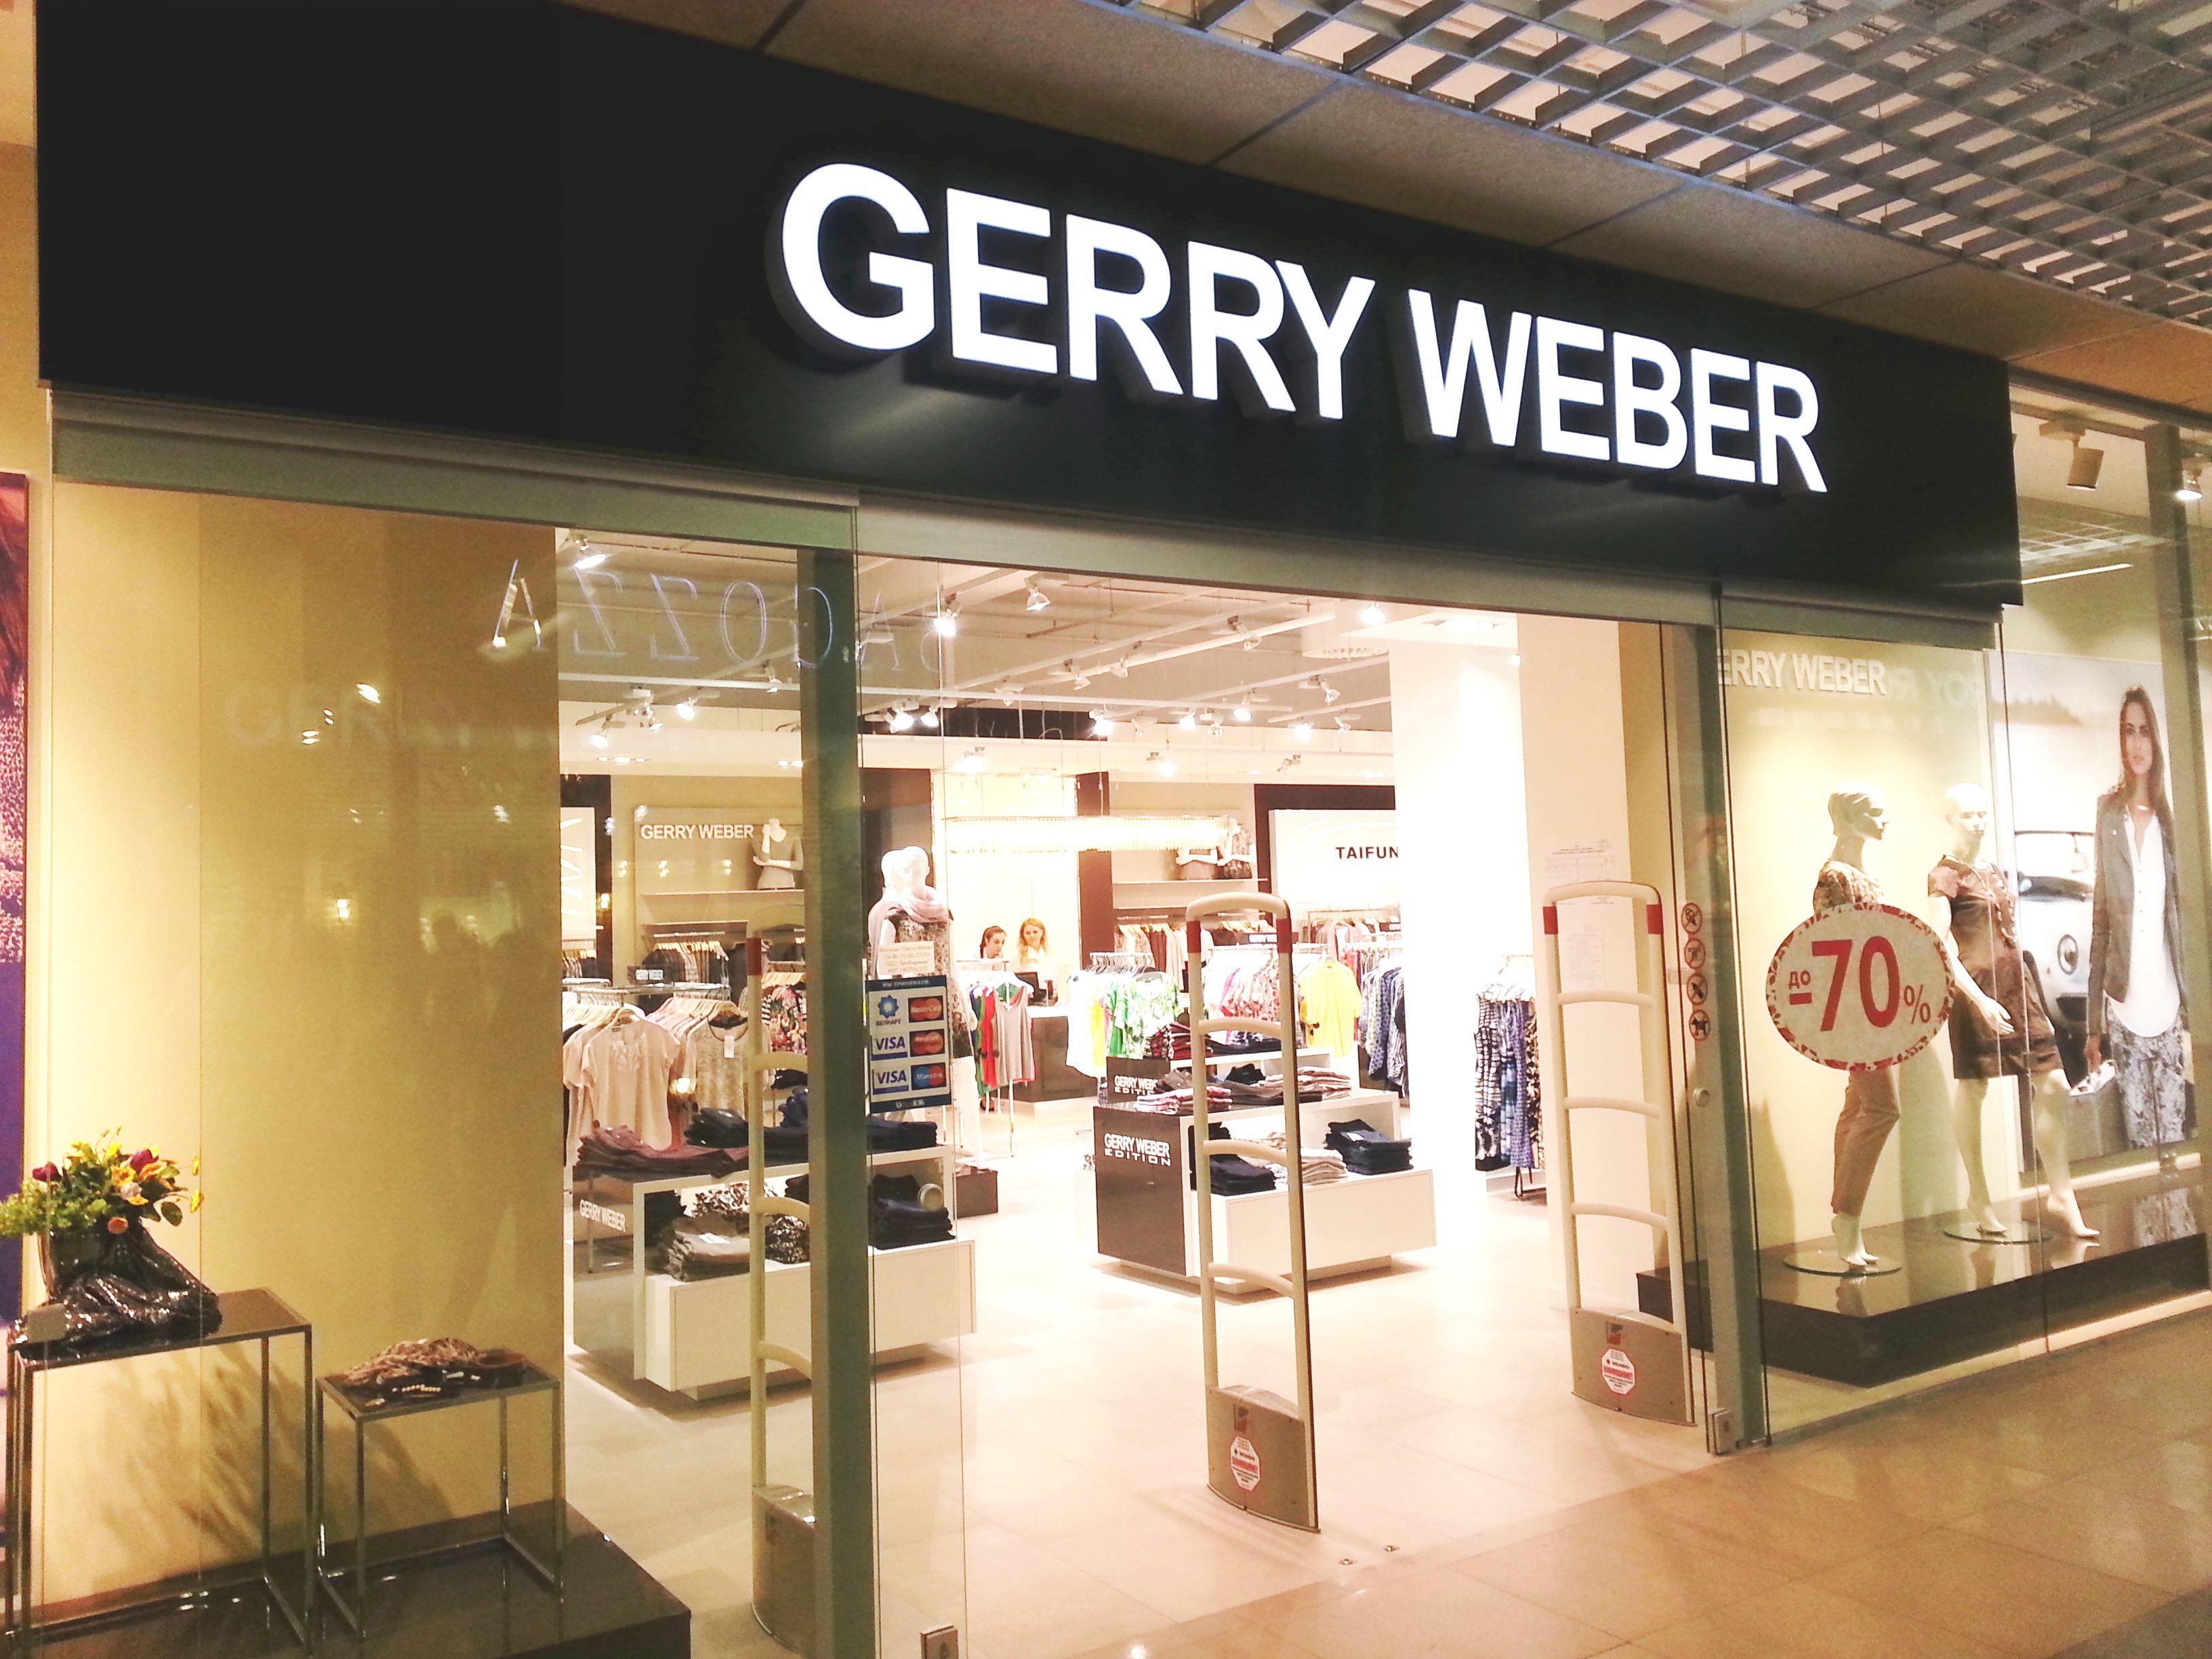 Gerry Weber (Герри Вебер)